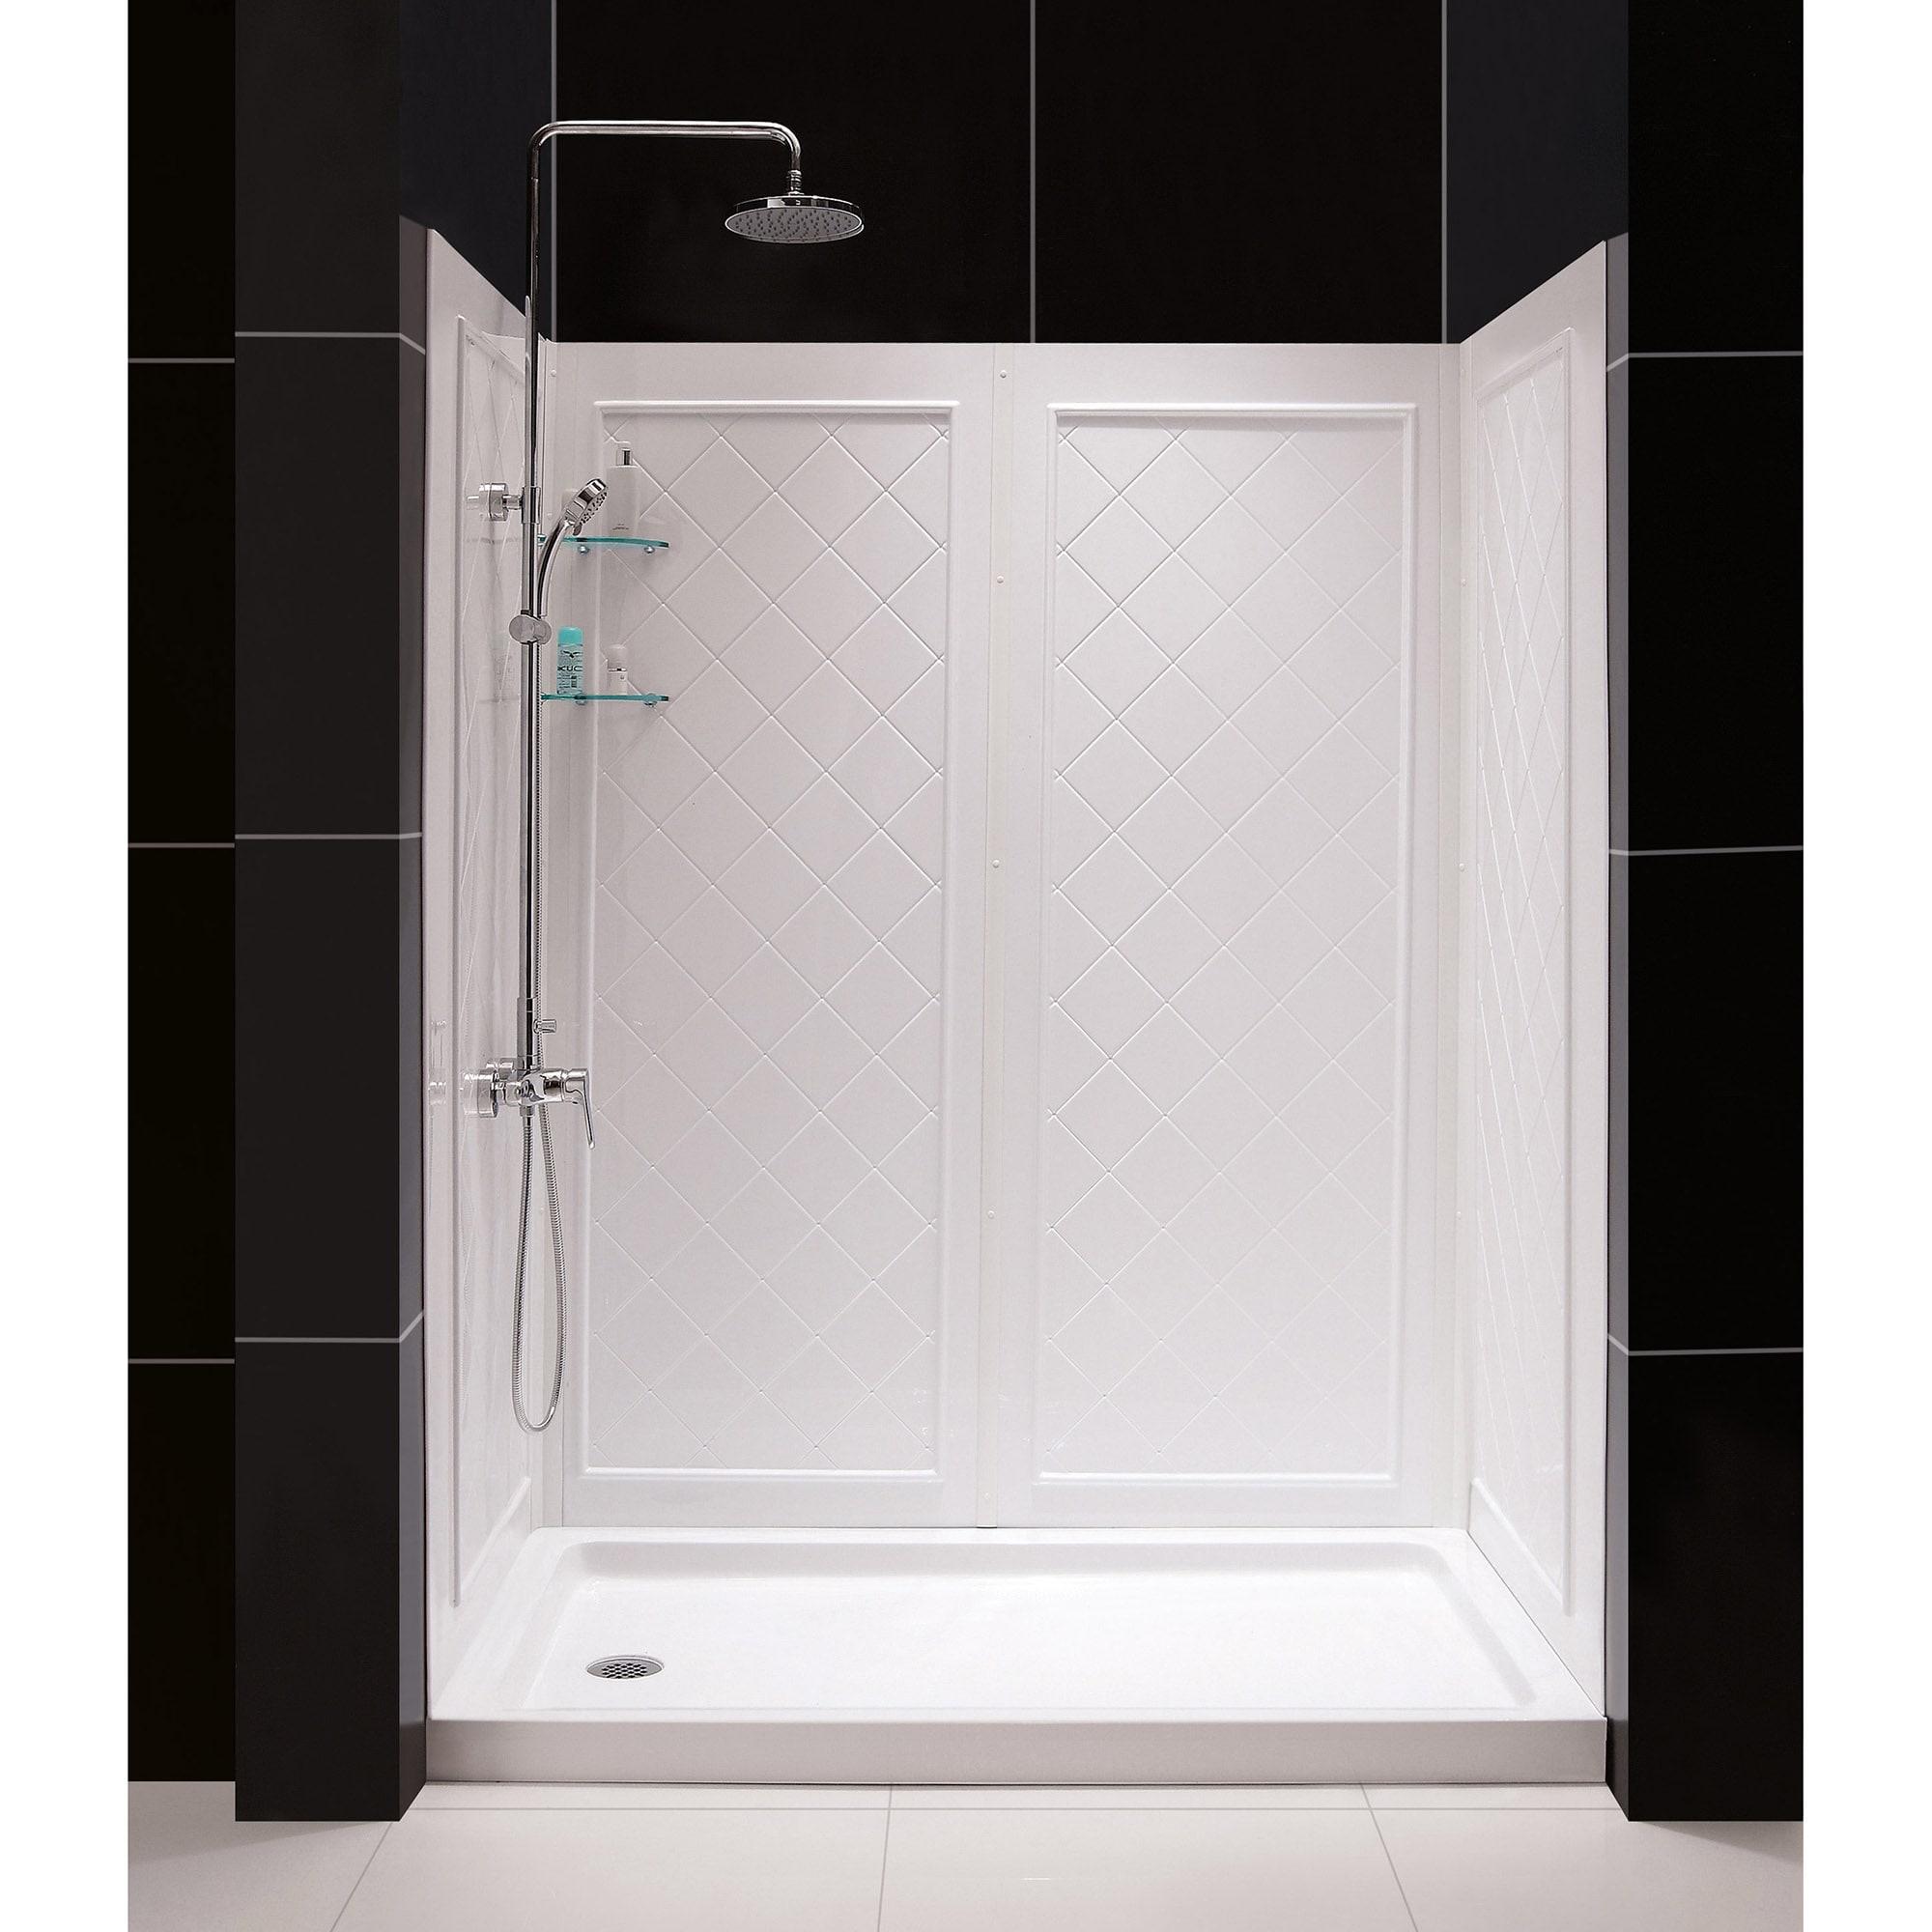 Bath4All - DreamLine DL-6189R-01 SlimLine 30 x 60\